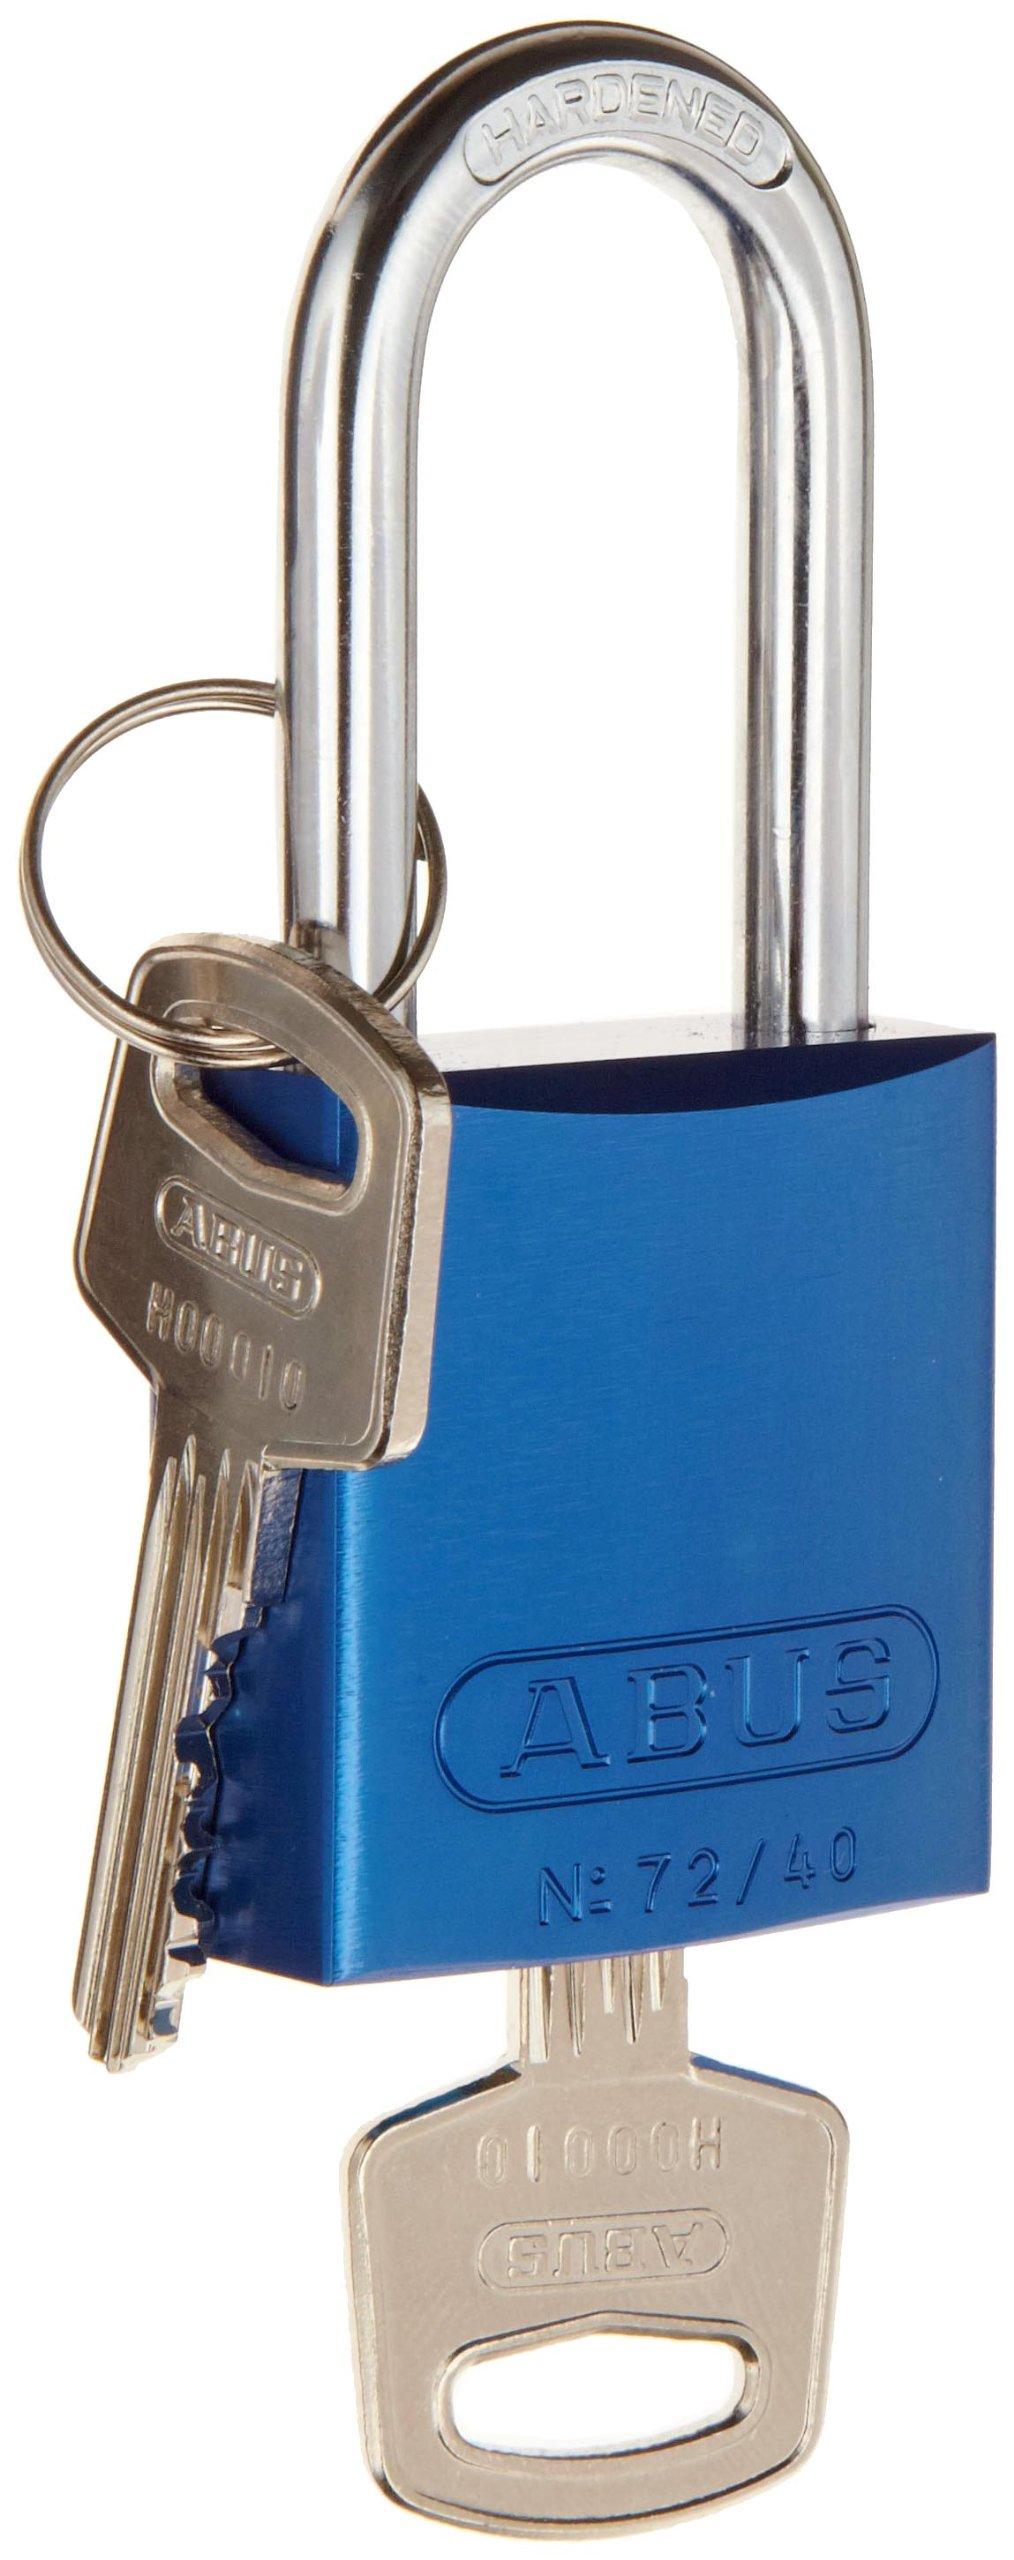 Brady  Aluminum Lockout/Tagout Padlock, Keyed Alike, 1-3/5'' Body Length, 1-1/2'' Shackle Clearance, Blue (Pack of 6)